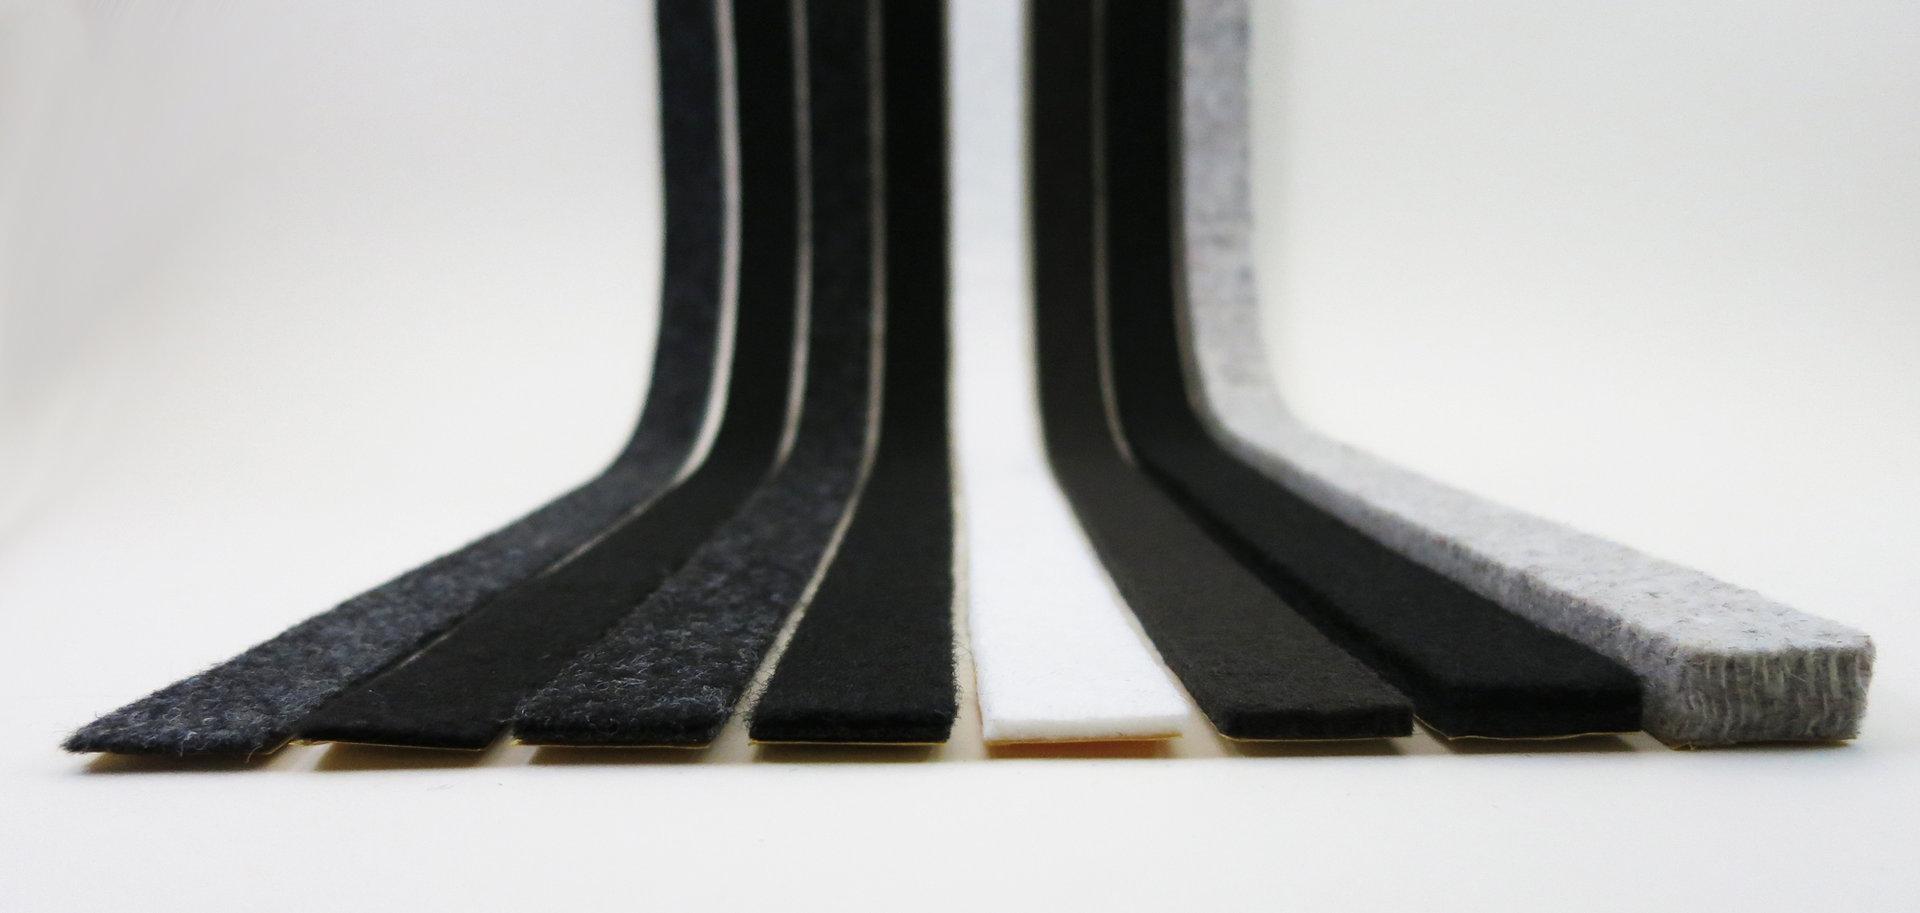 filzstreifen filzband meterware selbstklebend 3mm dick. Black Bedroom Furniture Sets. Home Design Ideas